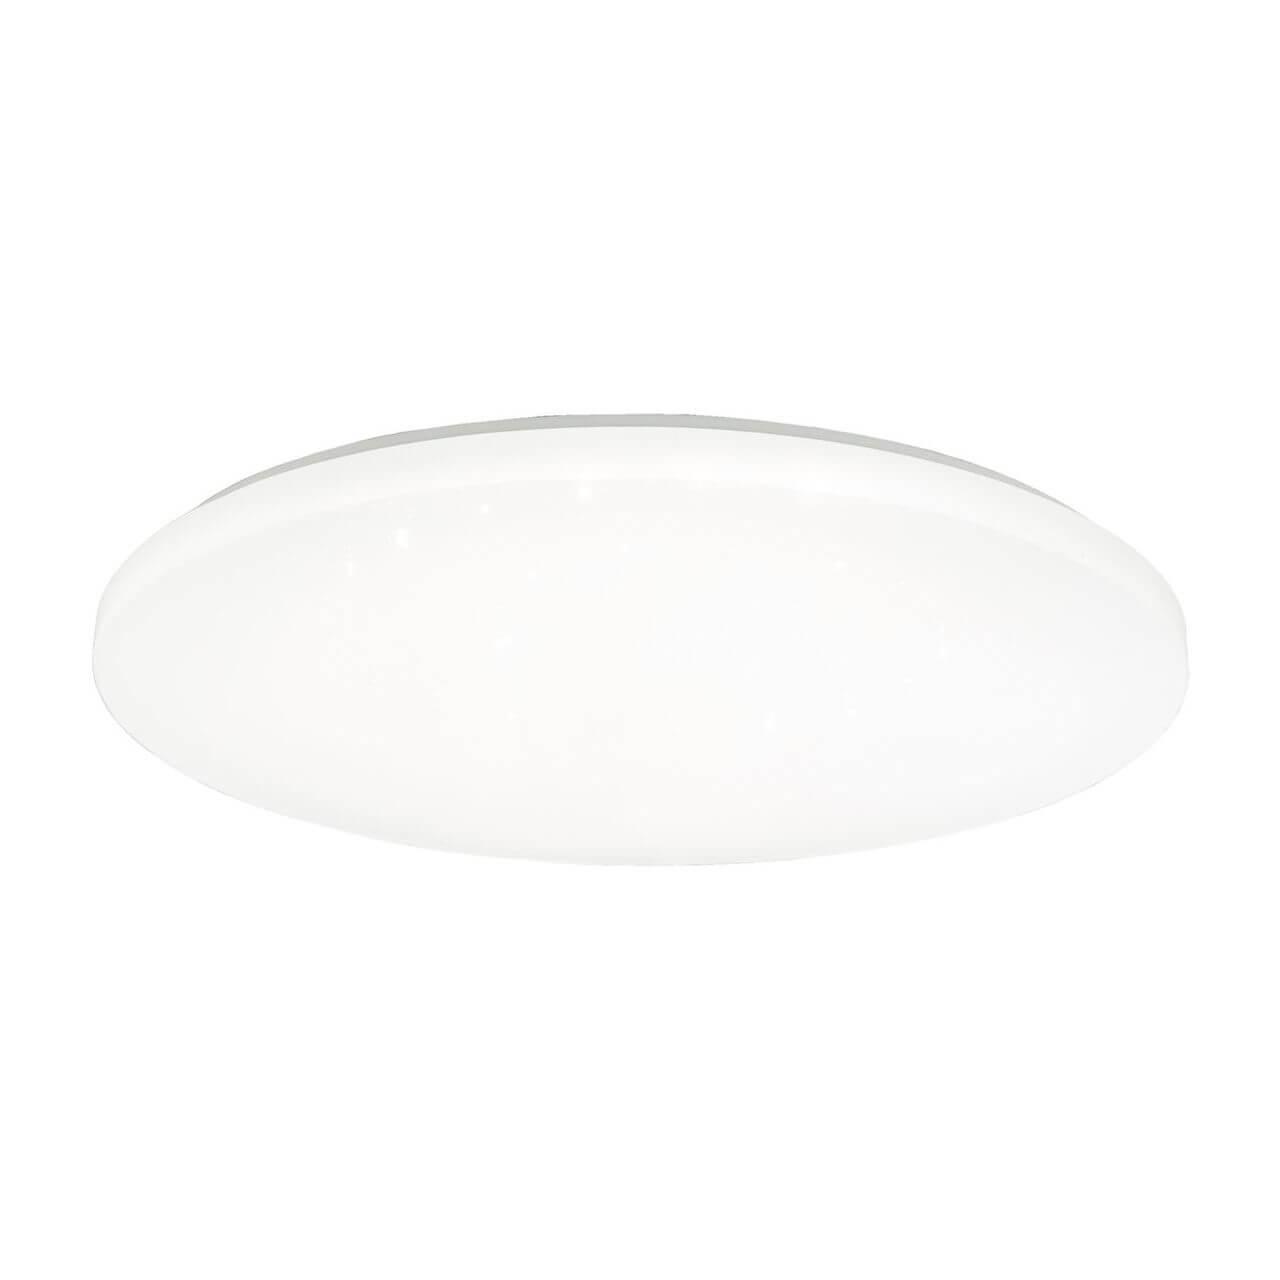 Накладной светильник Globo 41348-30, LED, 30 Вт накладной светильник globo claire 48077